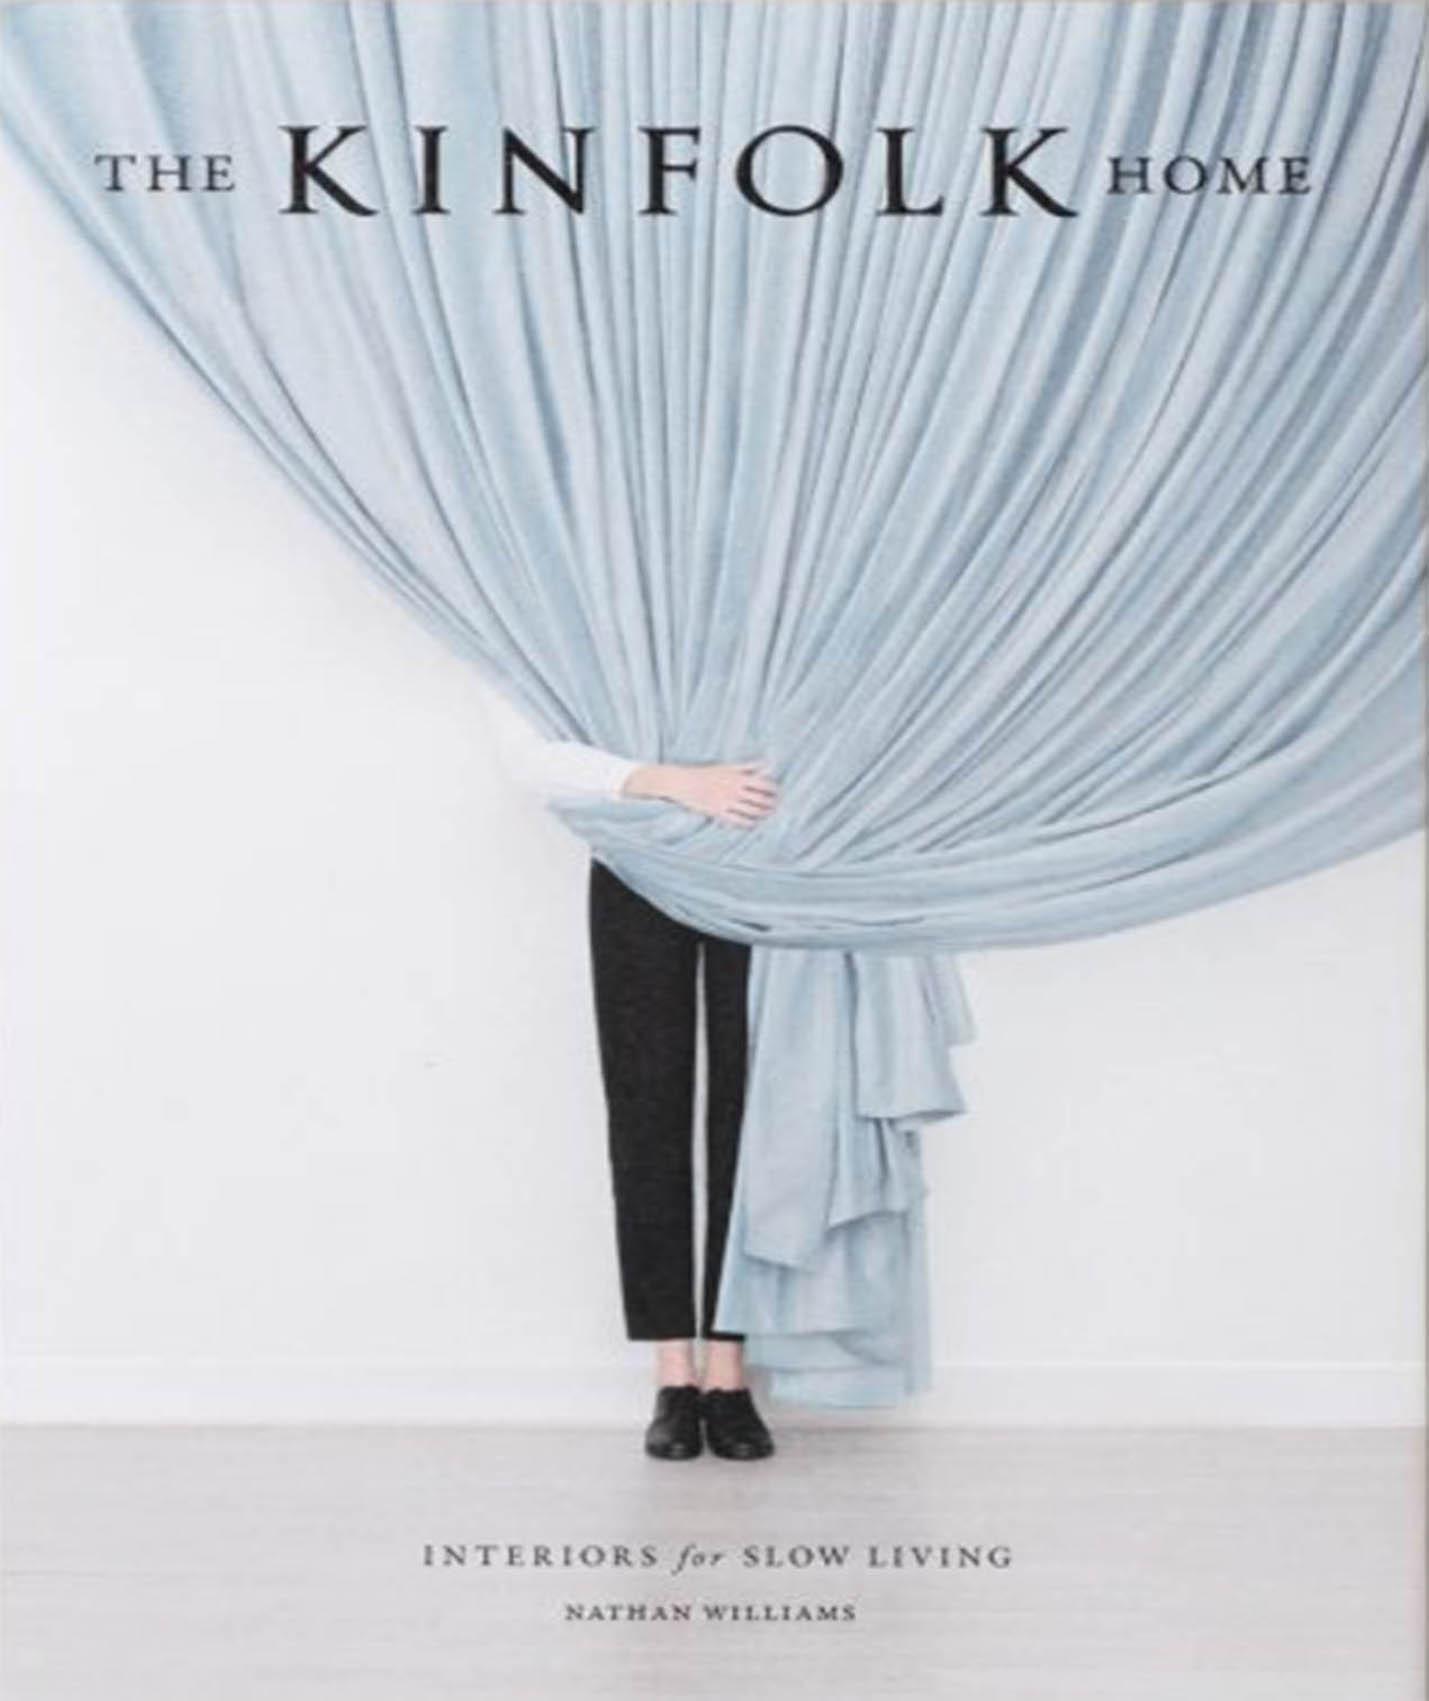 The Kinfolk Home - design